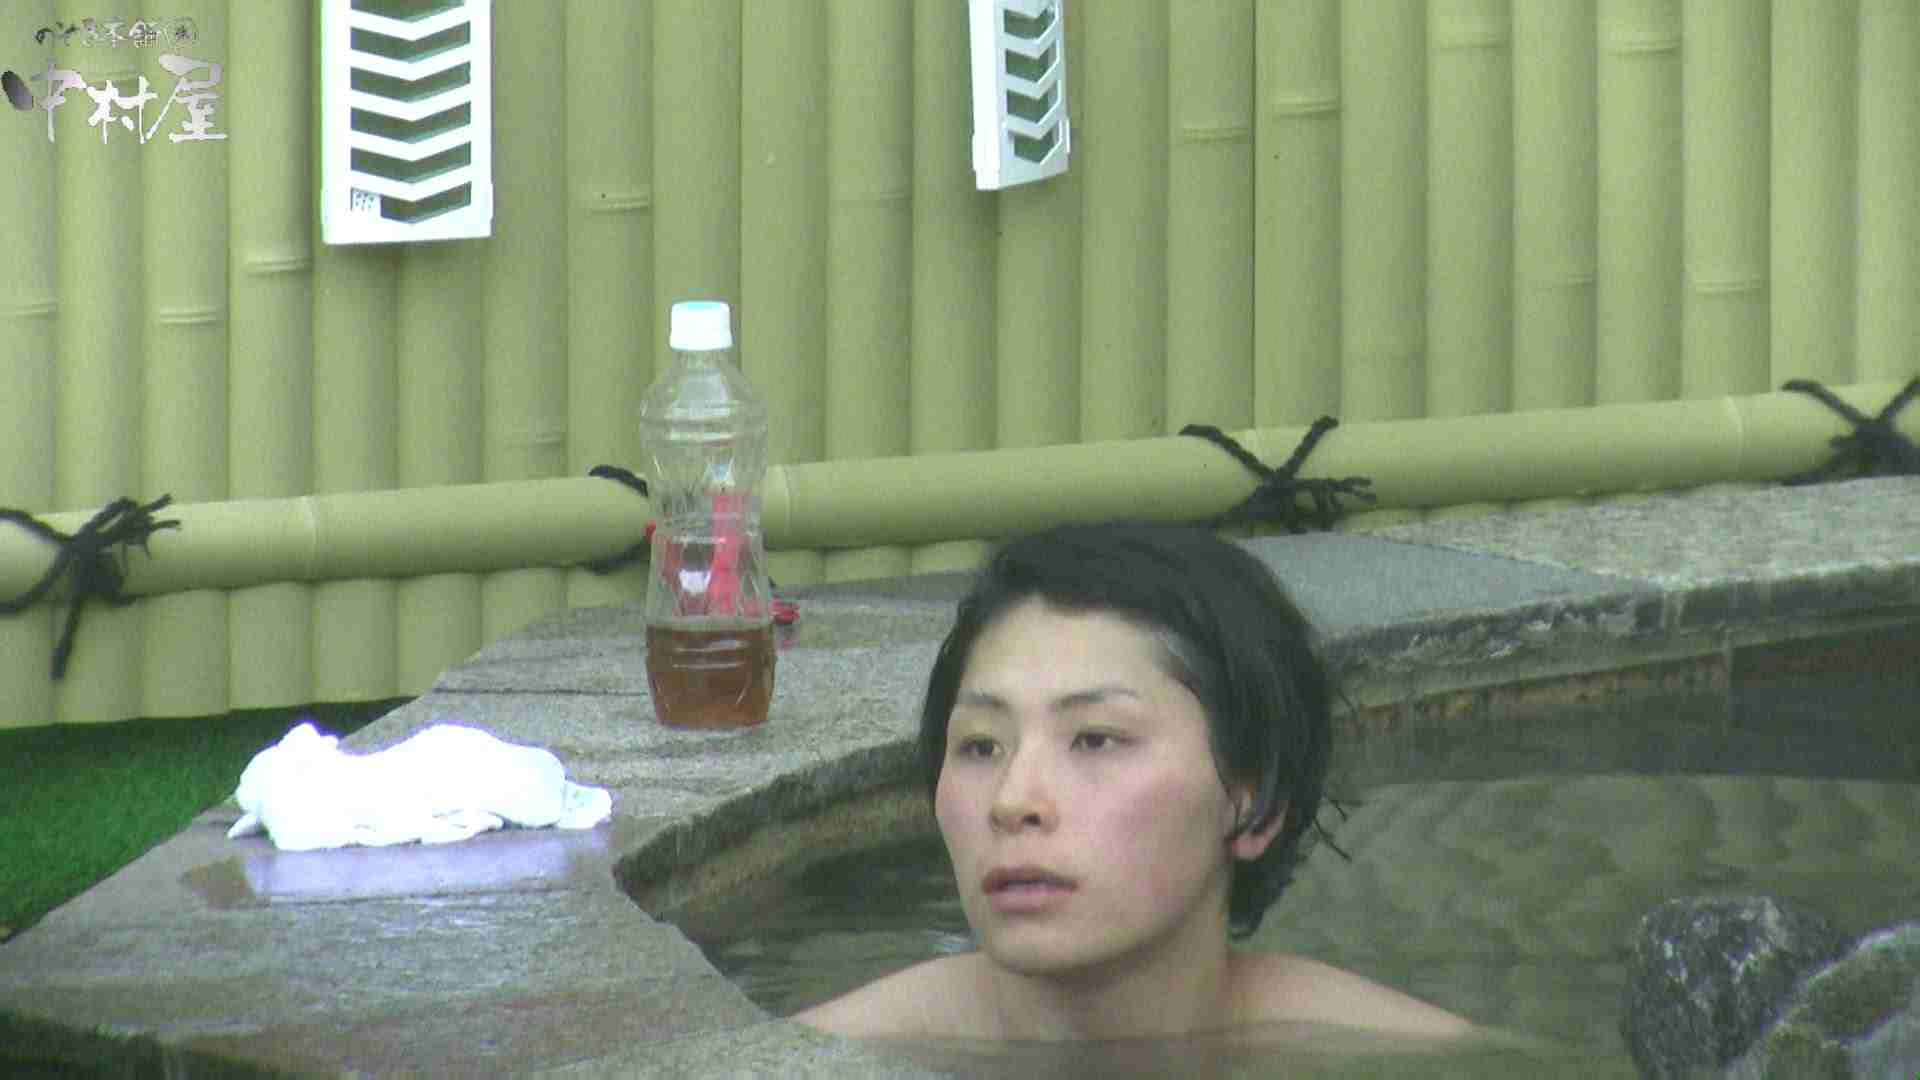 Aquaな露天風呂Vol.970 OL  59連発 18